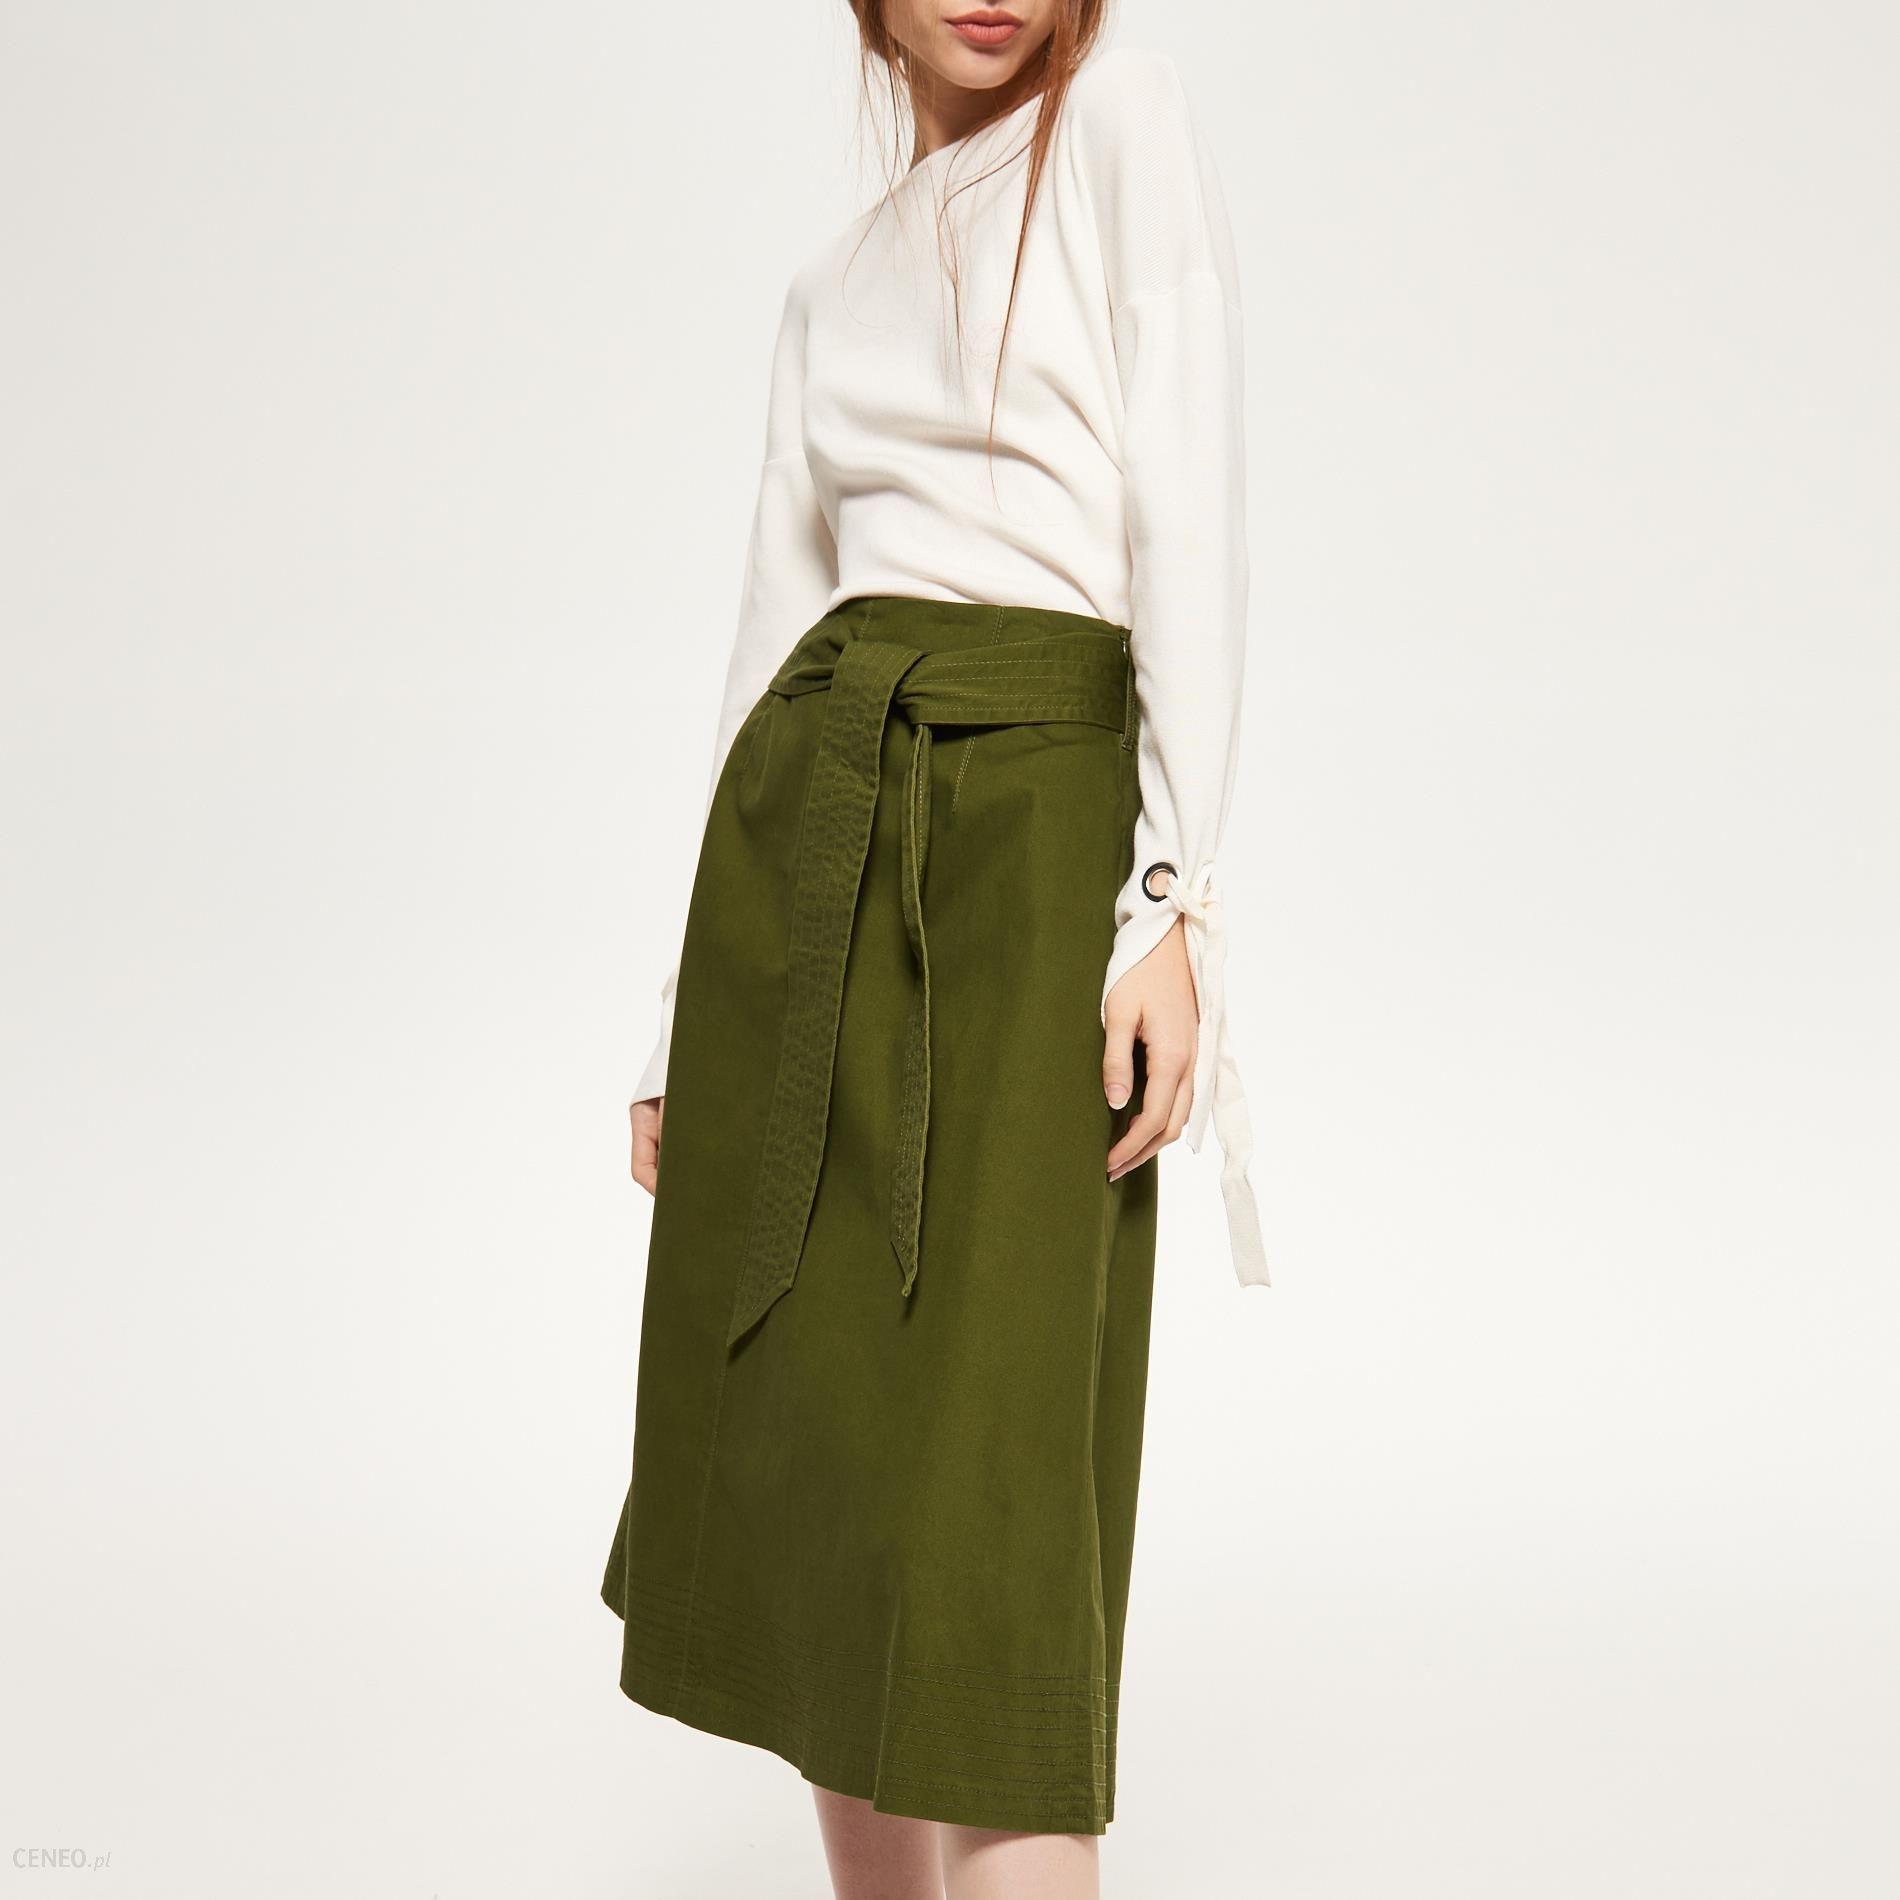 Reserved Militarna spódnica Zielony damska Ceny i